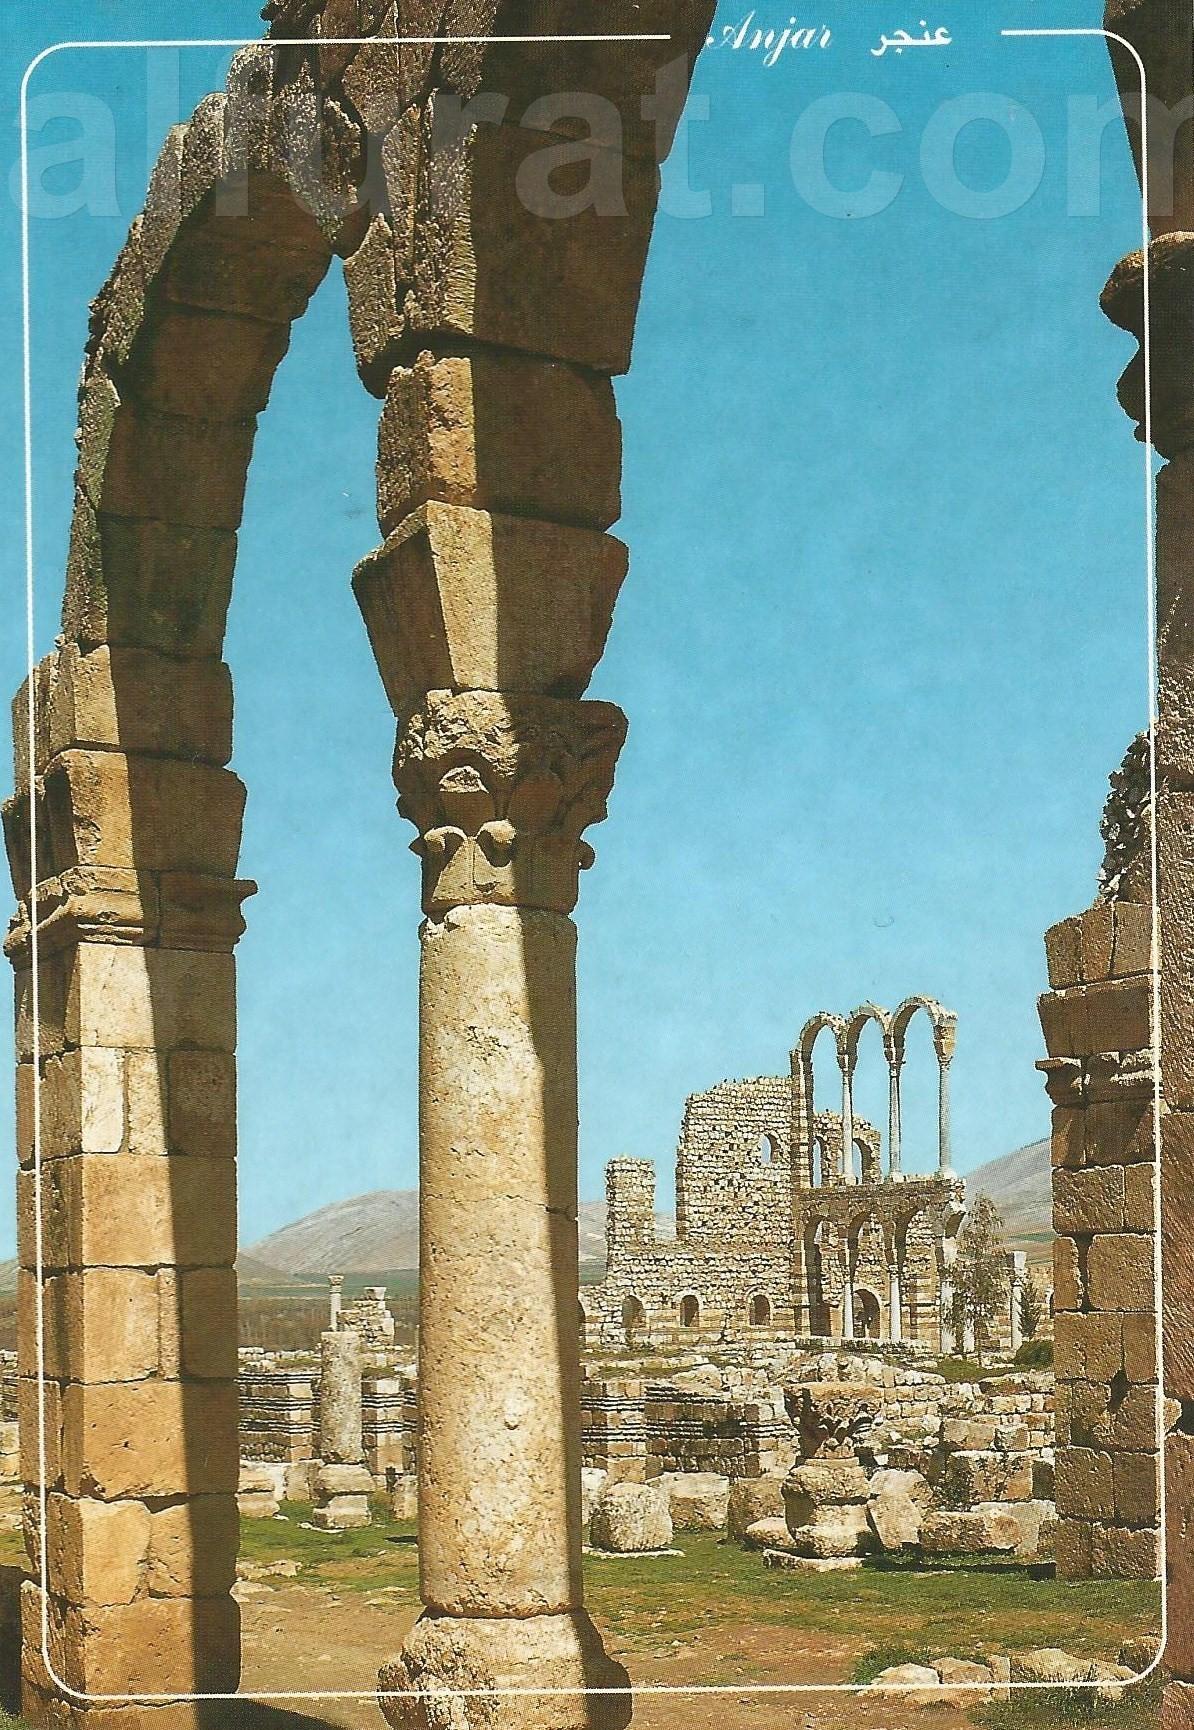 Anjar - the Byzantine and Ommayad Ruins